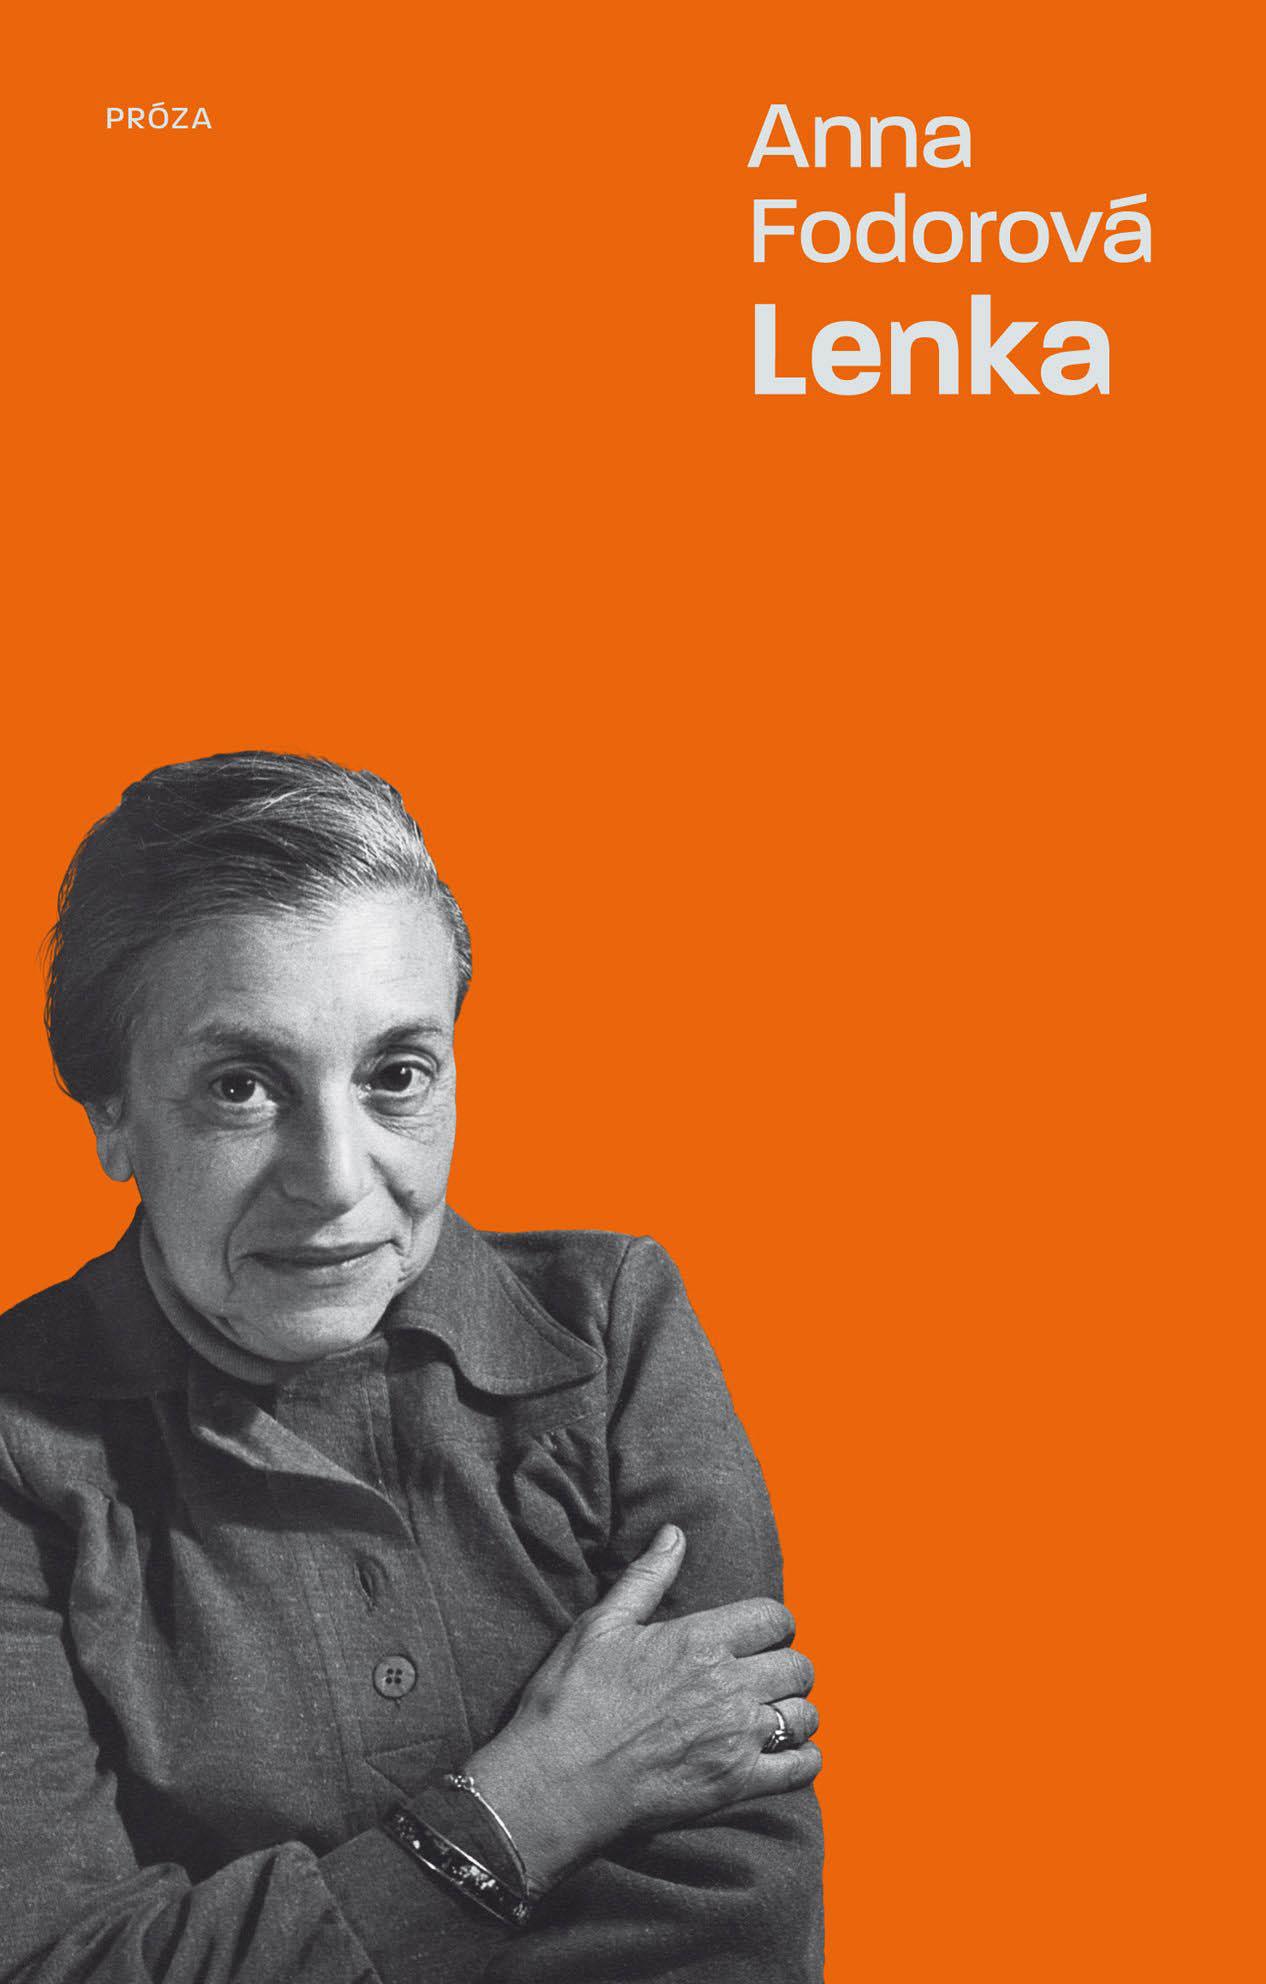 Anna Fodorová Lenka (nakladatelství Labyrint, Praha, 2020, 176 s.)